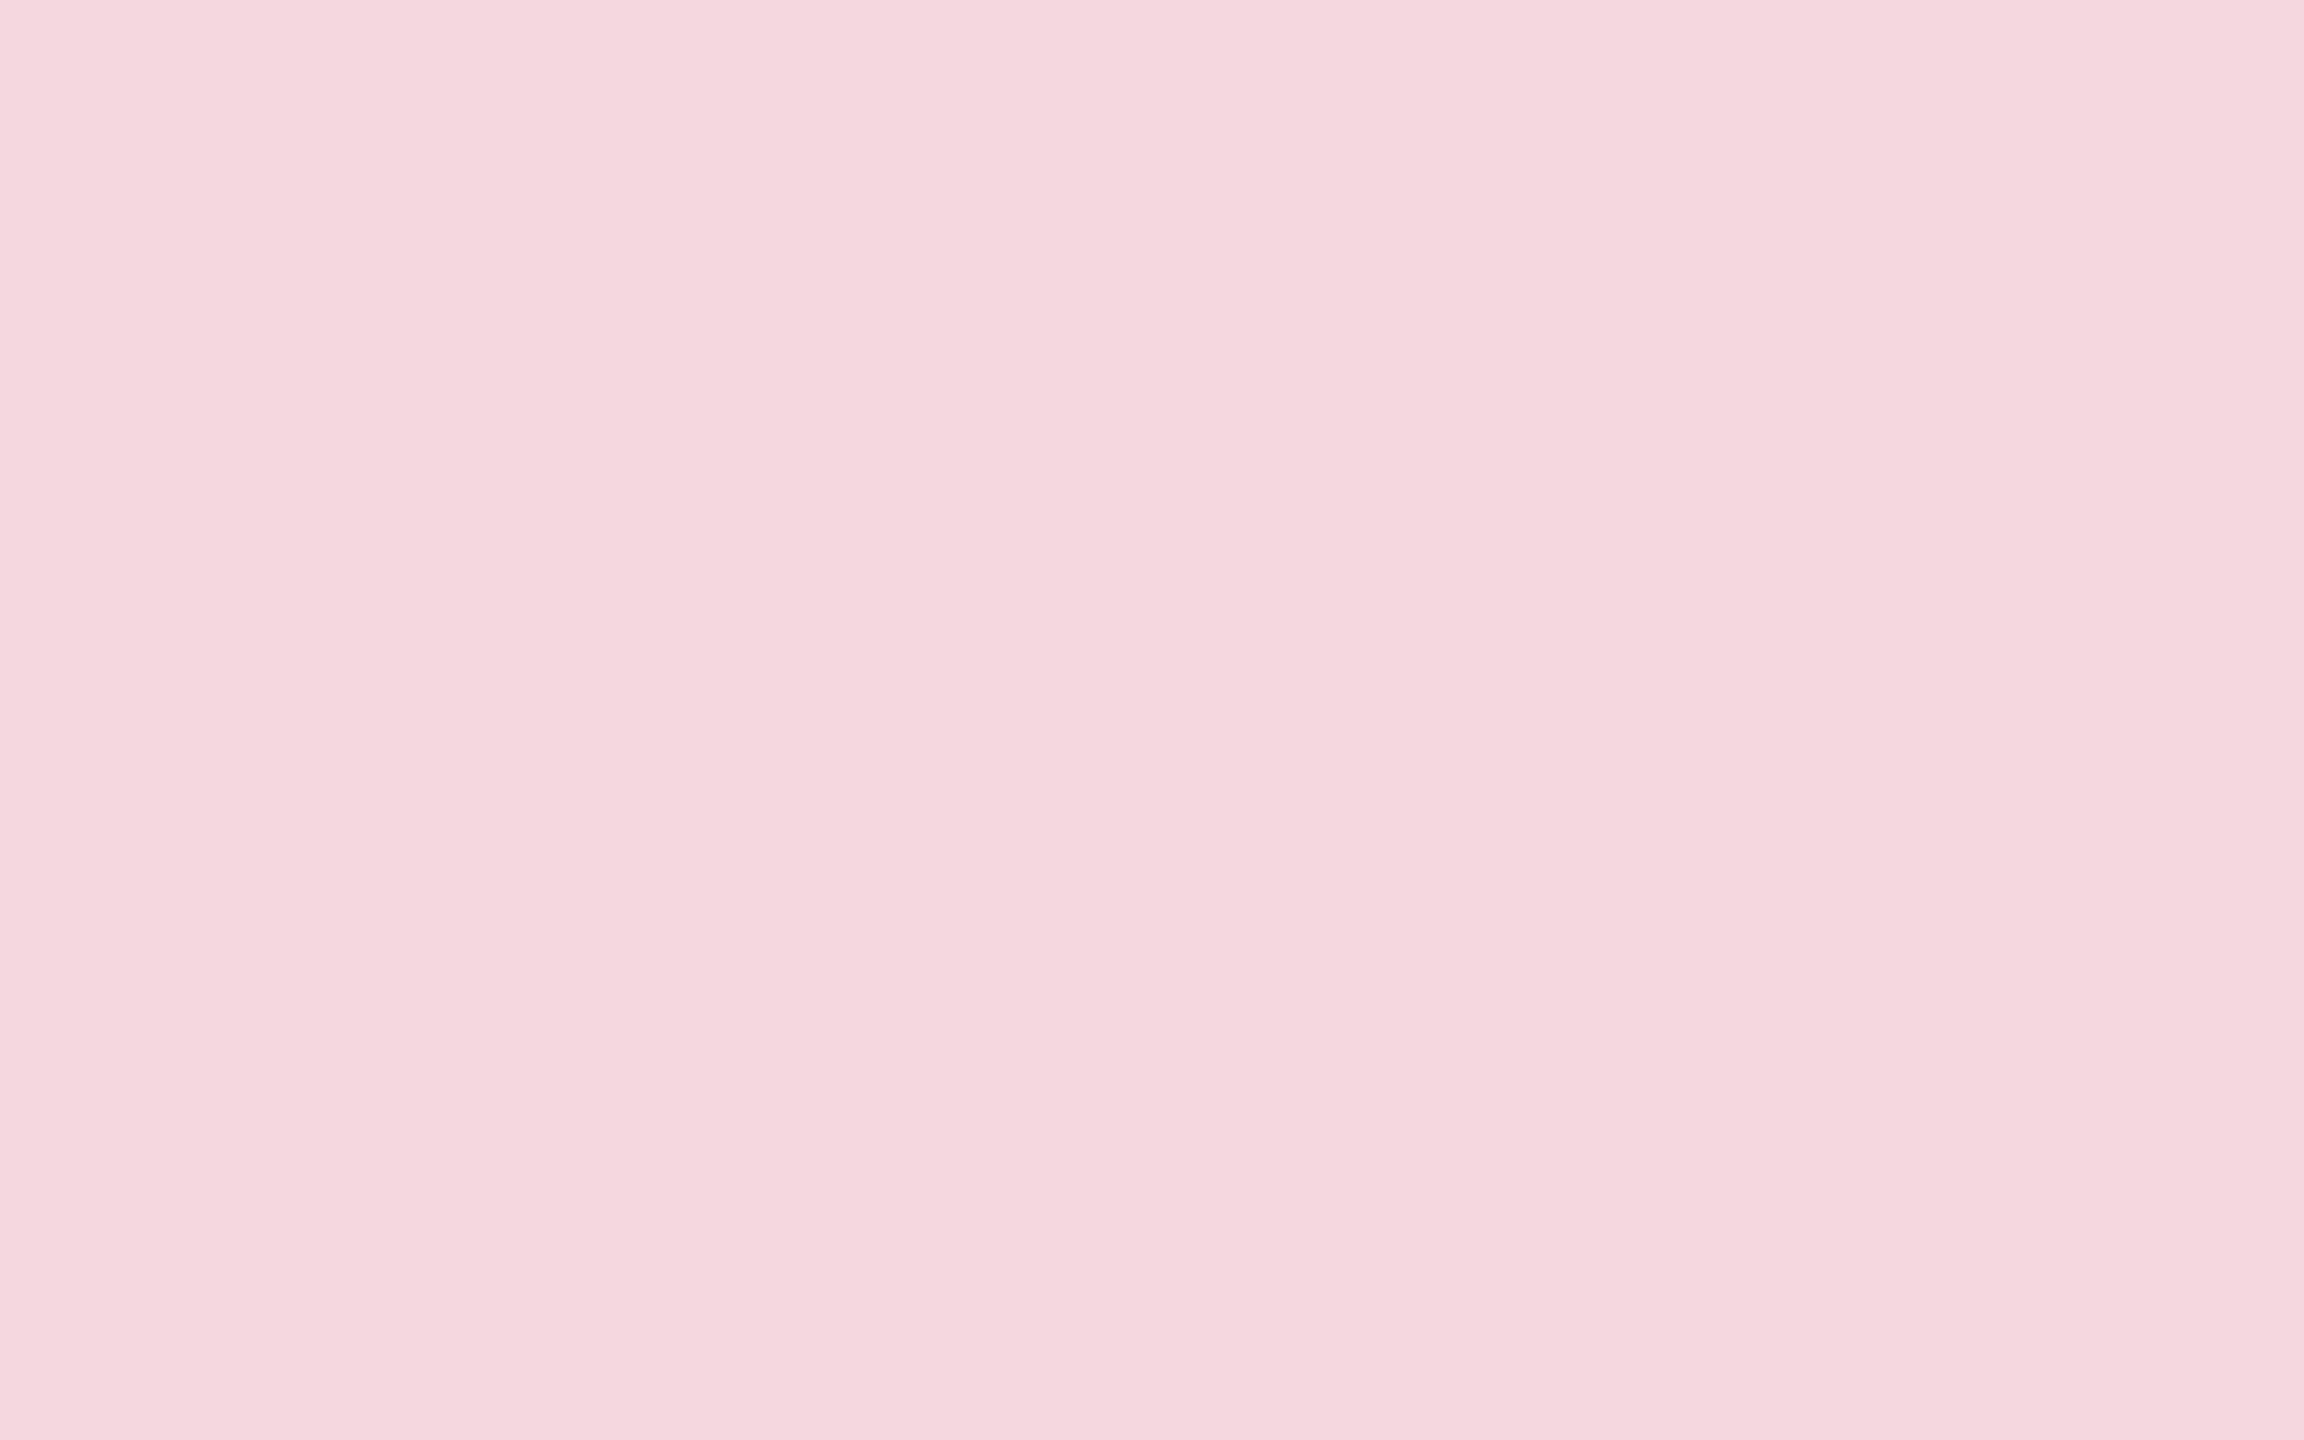 2304x1440 Vanilla Ice Solid Color Background